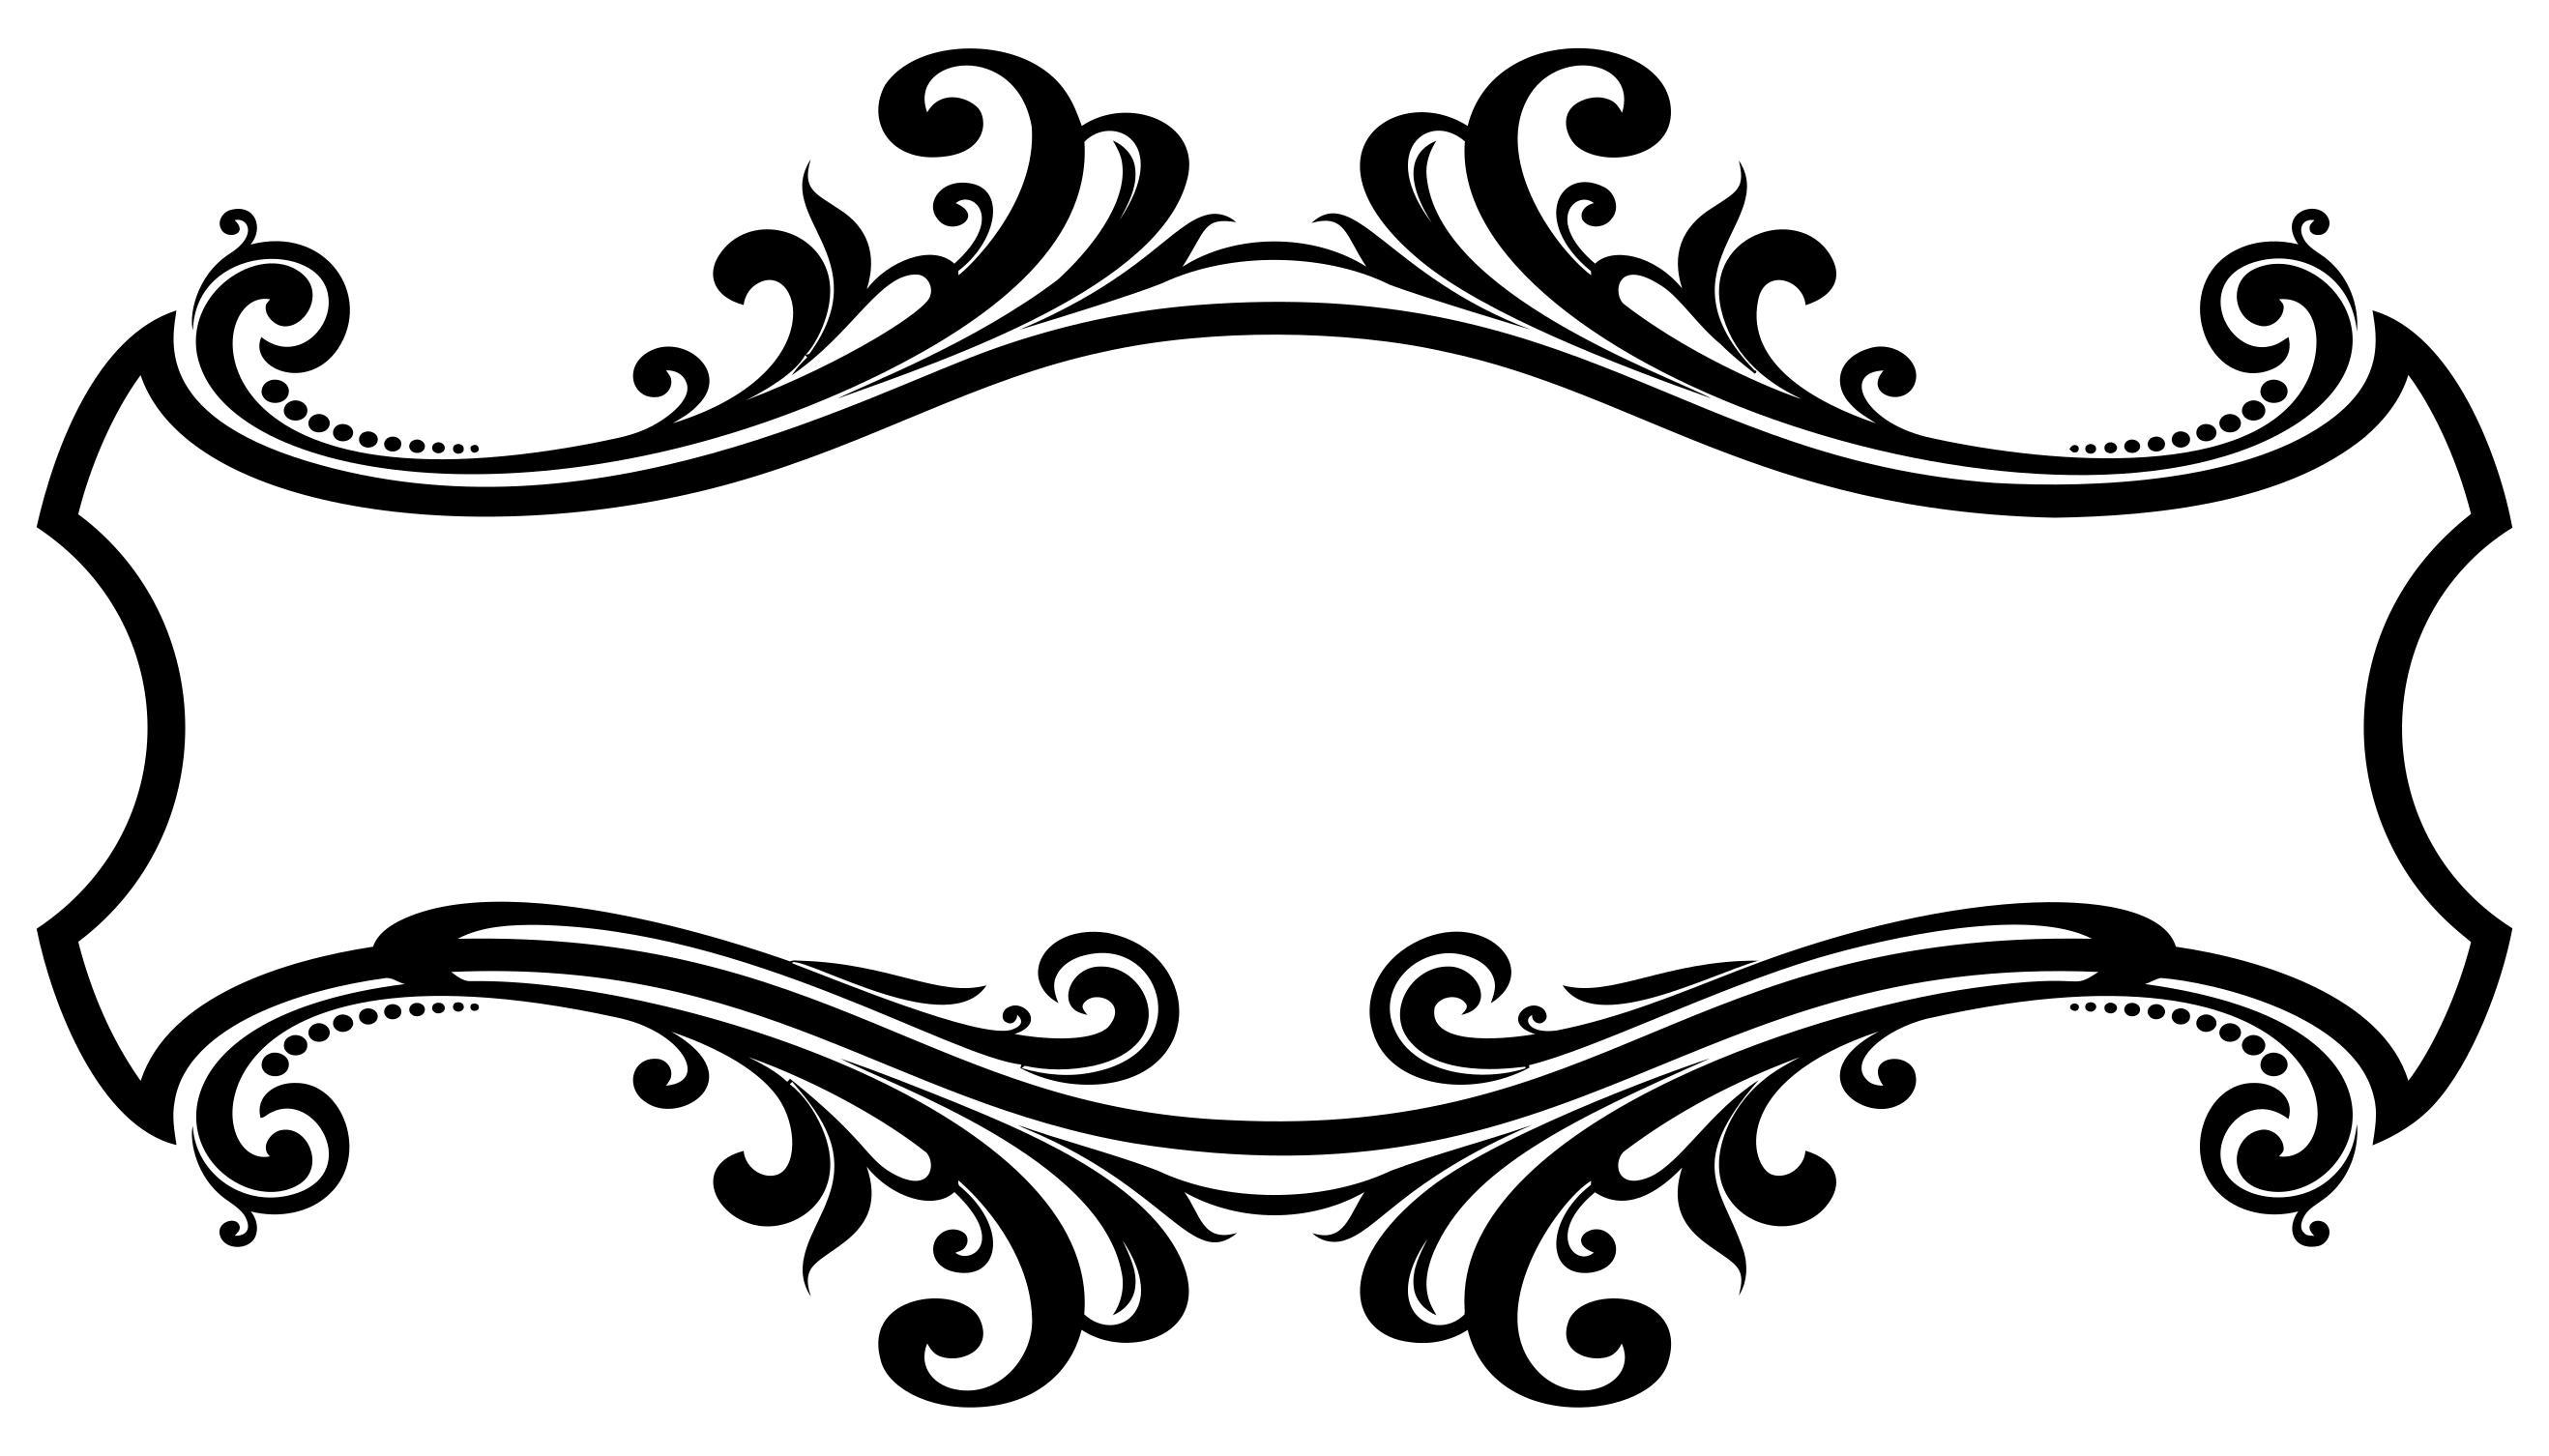 Decorative flourish frame design. Button clipart ornamental